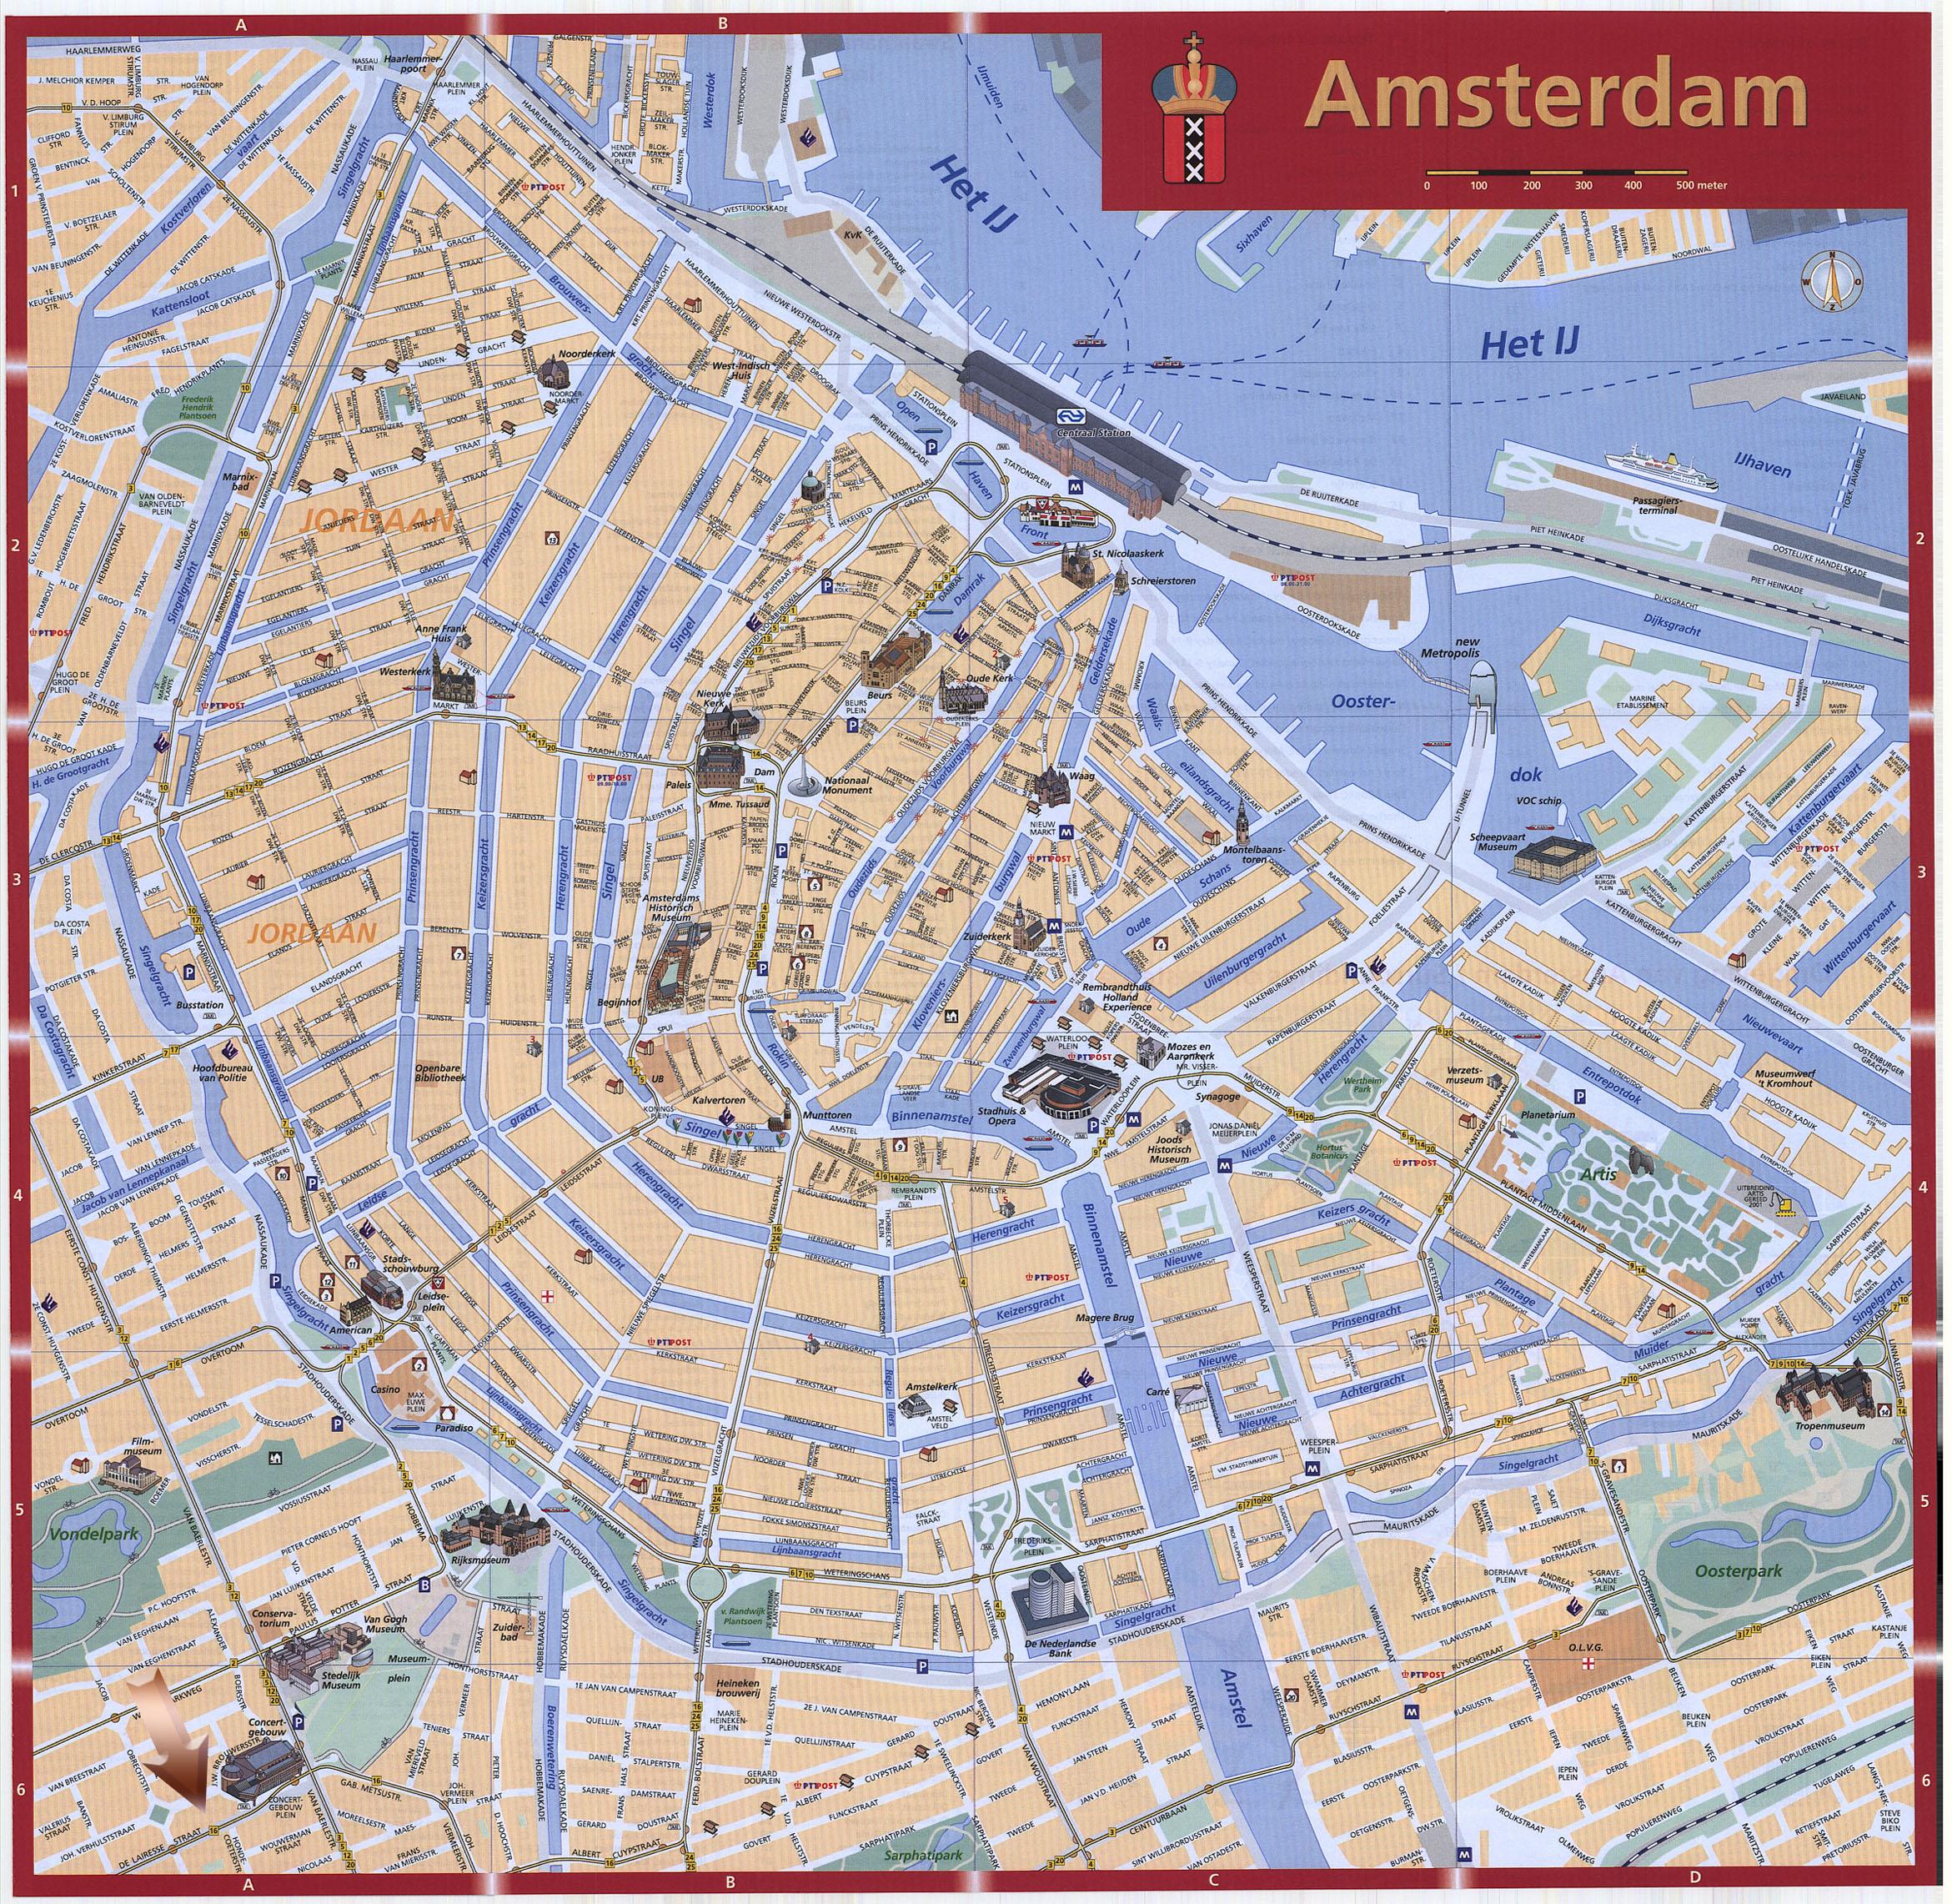 mapa turistico de amesterdao mapa metro París, mapa metro Londres, mapa metro Roma, mapa  mapa turistico de amesterdao